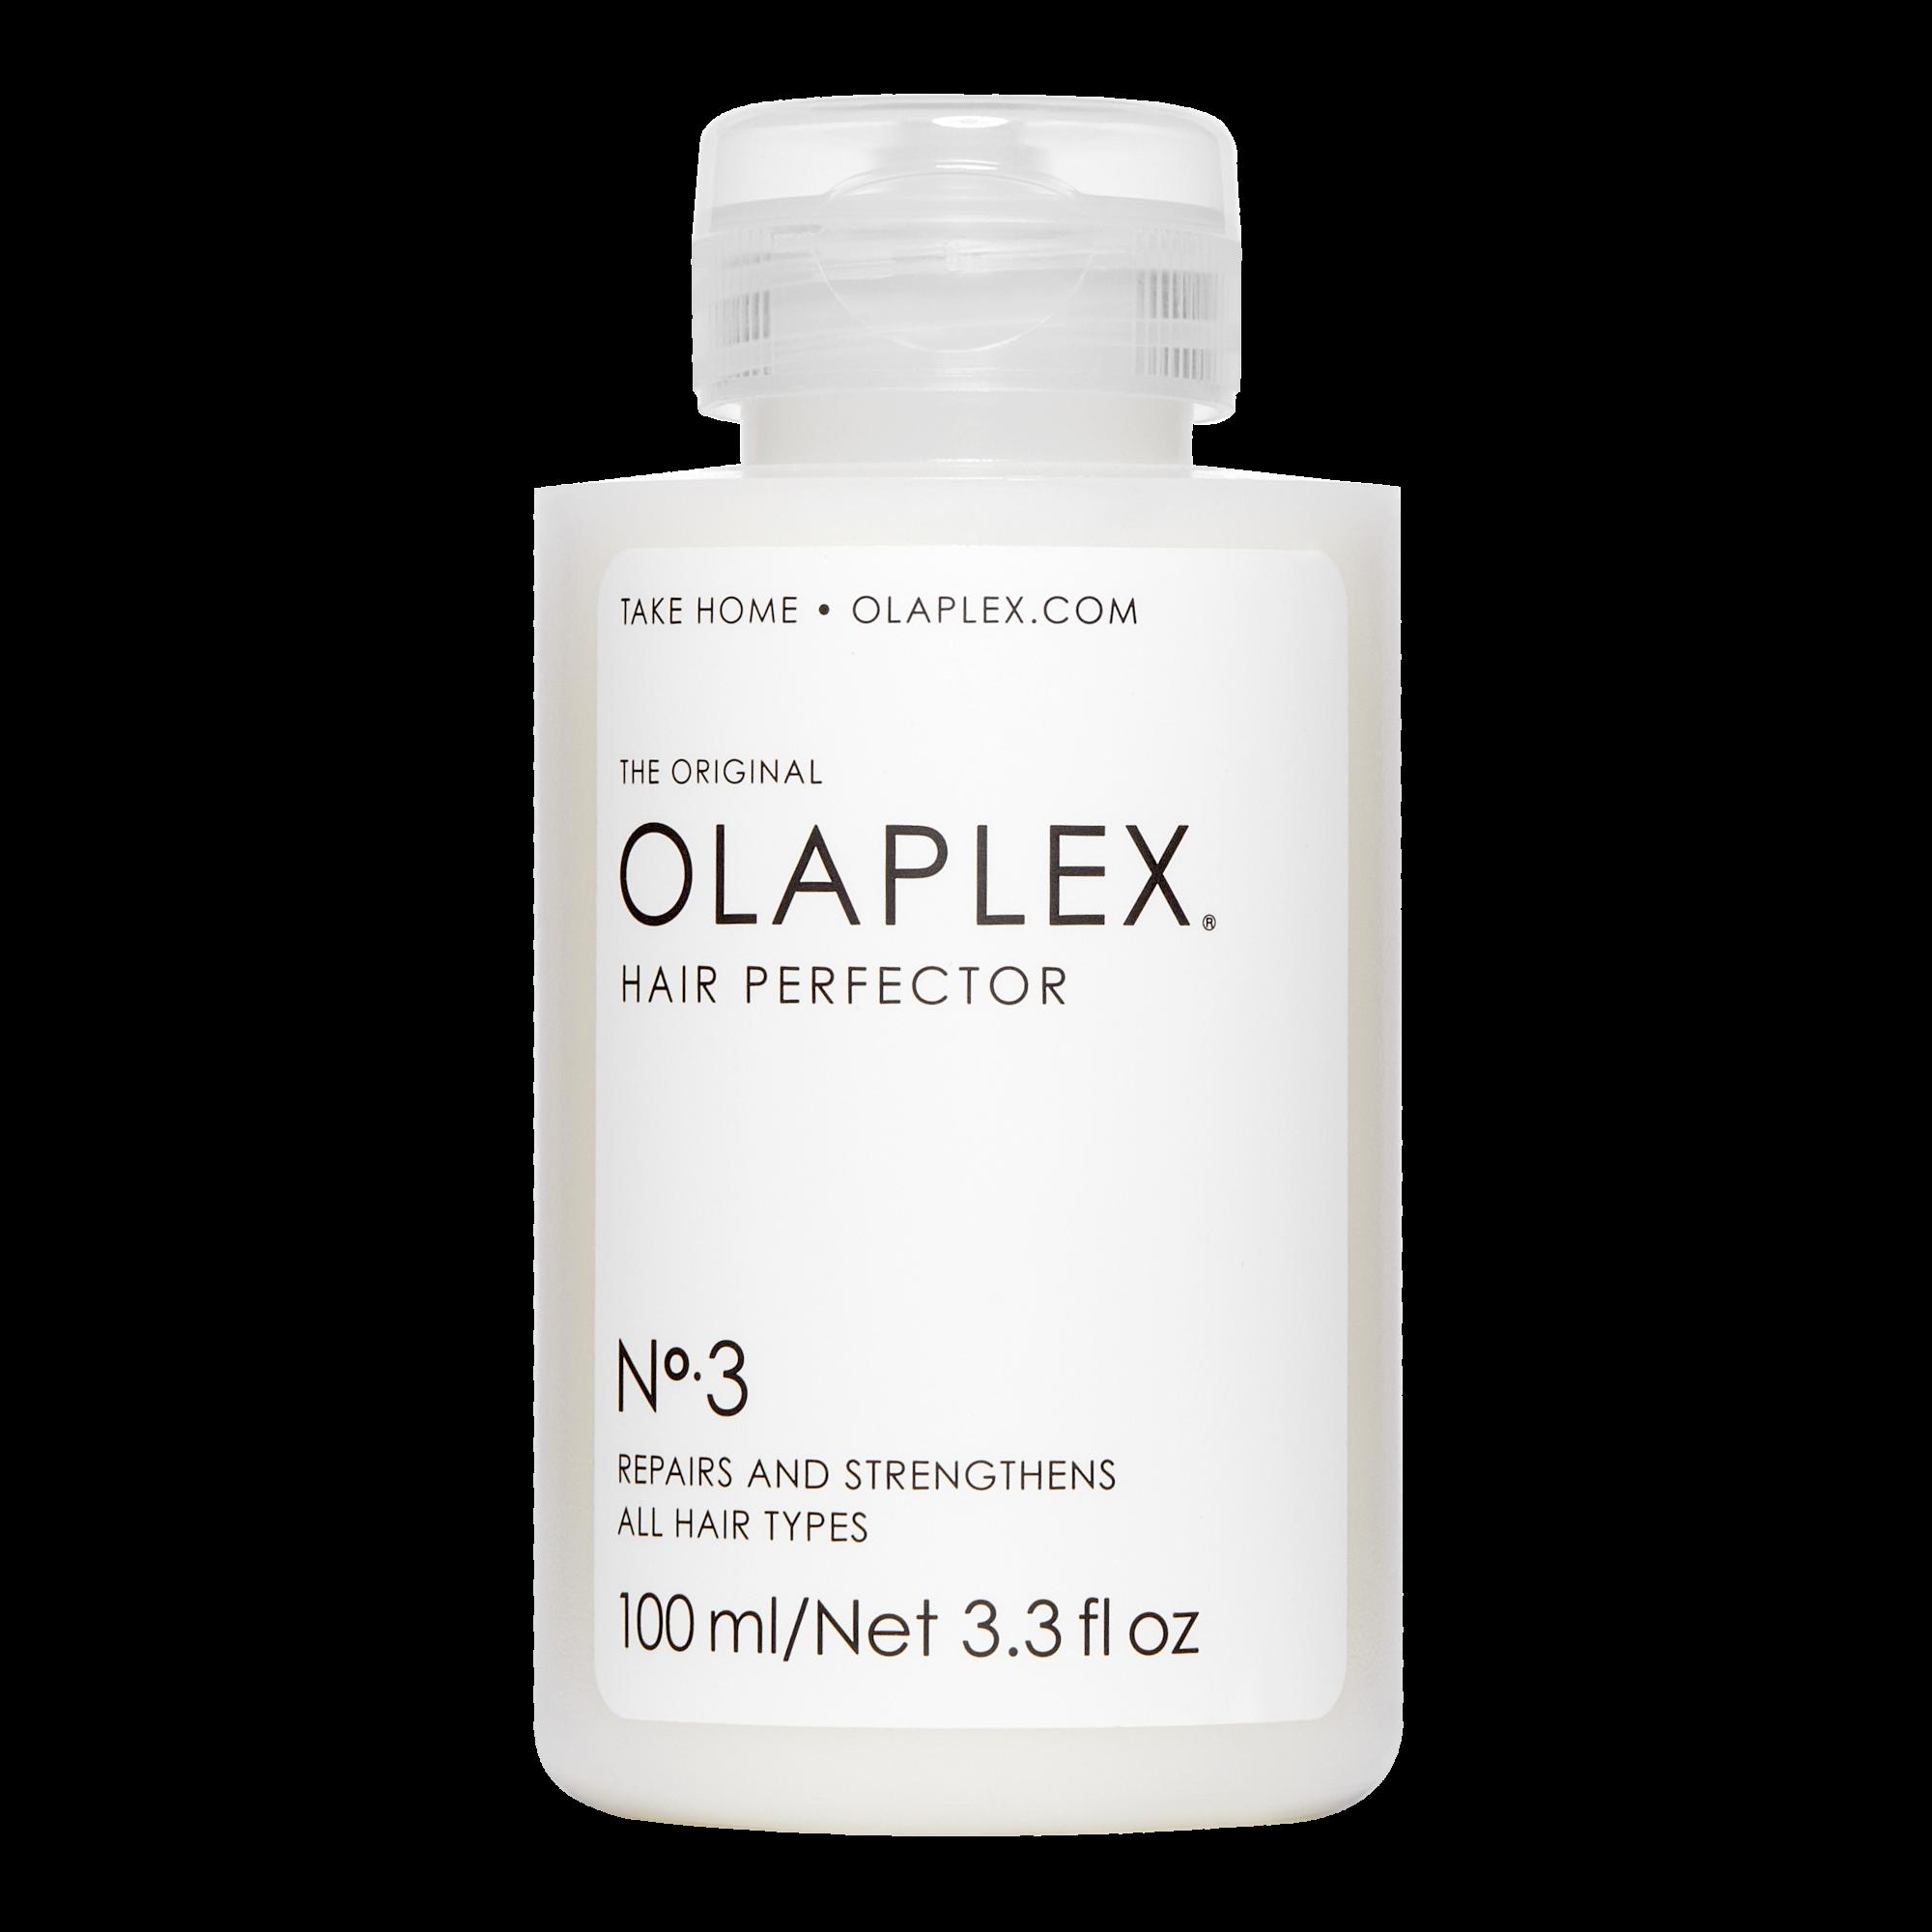 OLAPLEX® N° 3 Hair Perfector grid image